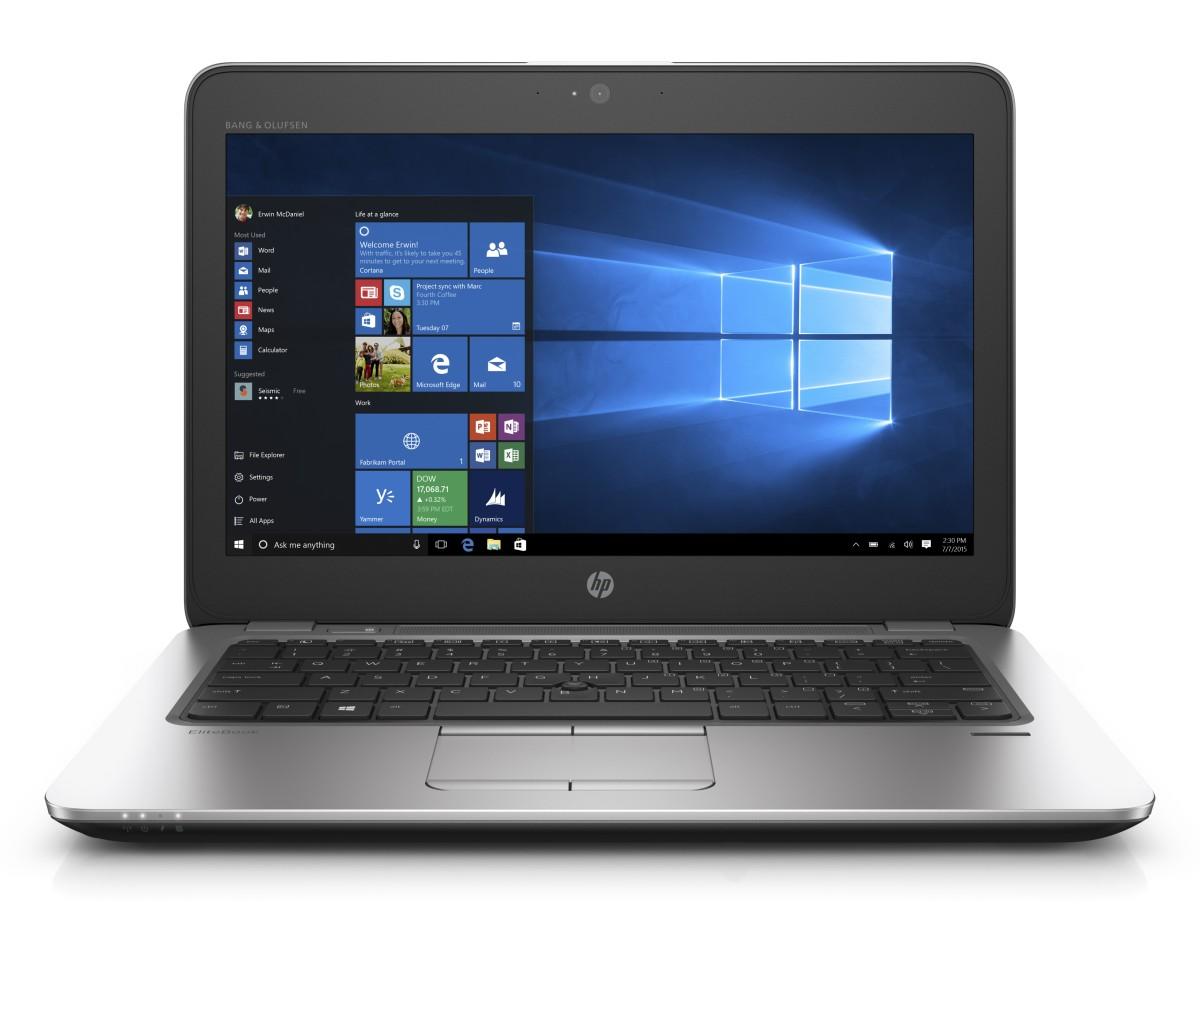 "HP EliteBook 820 G4 i7-7500U/8GB/512GB SSD TurboG2/12.5"" FHD/ backlit keyb /Win 10 Pro"